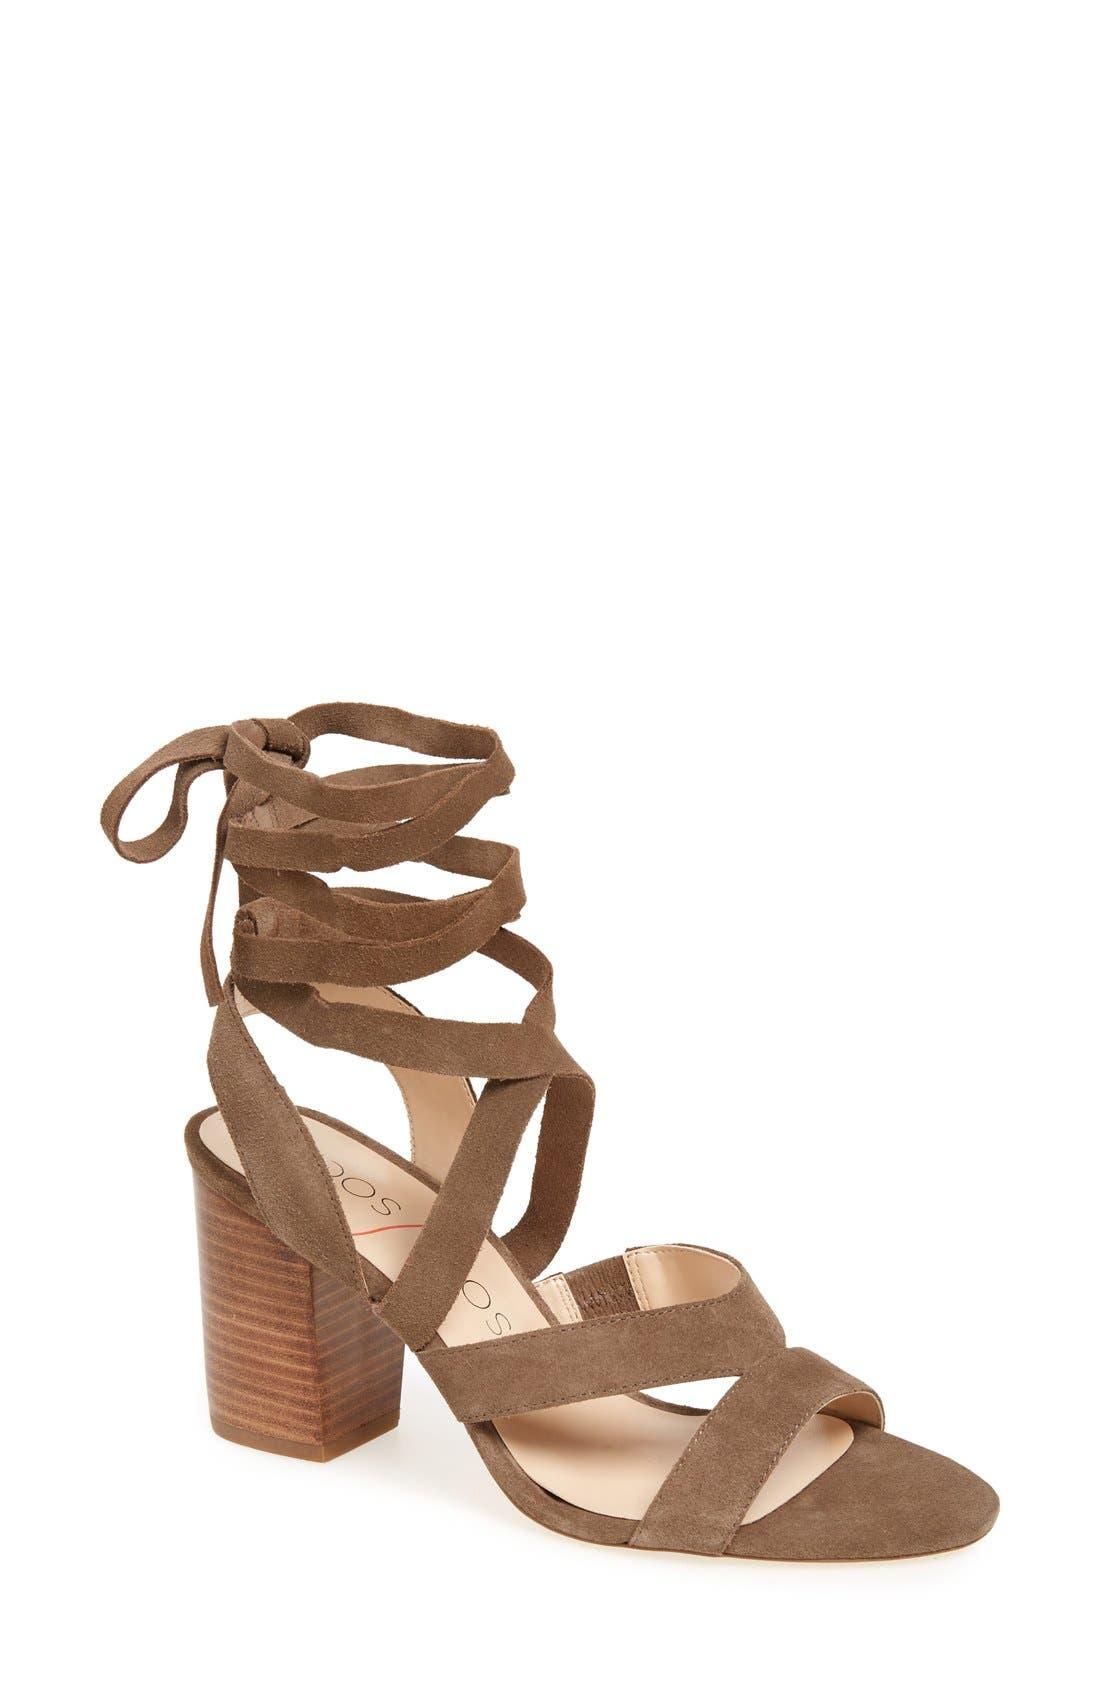 Alternate Image 1 Selected - Sole Society 'Lyla' Lace-Up Sandal (Women)